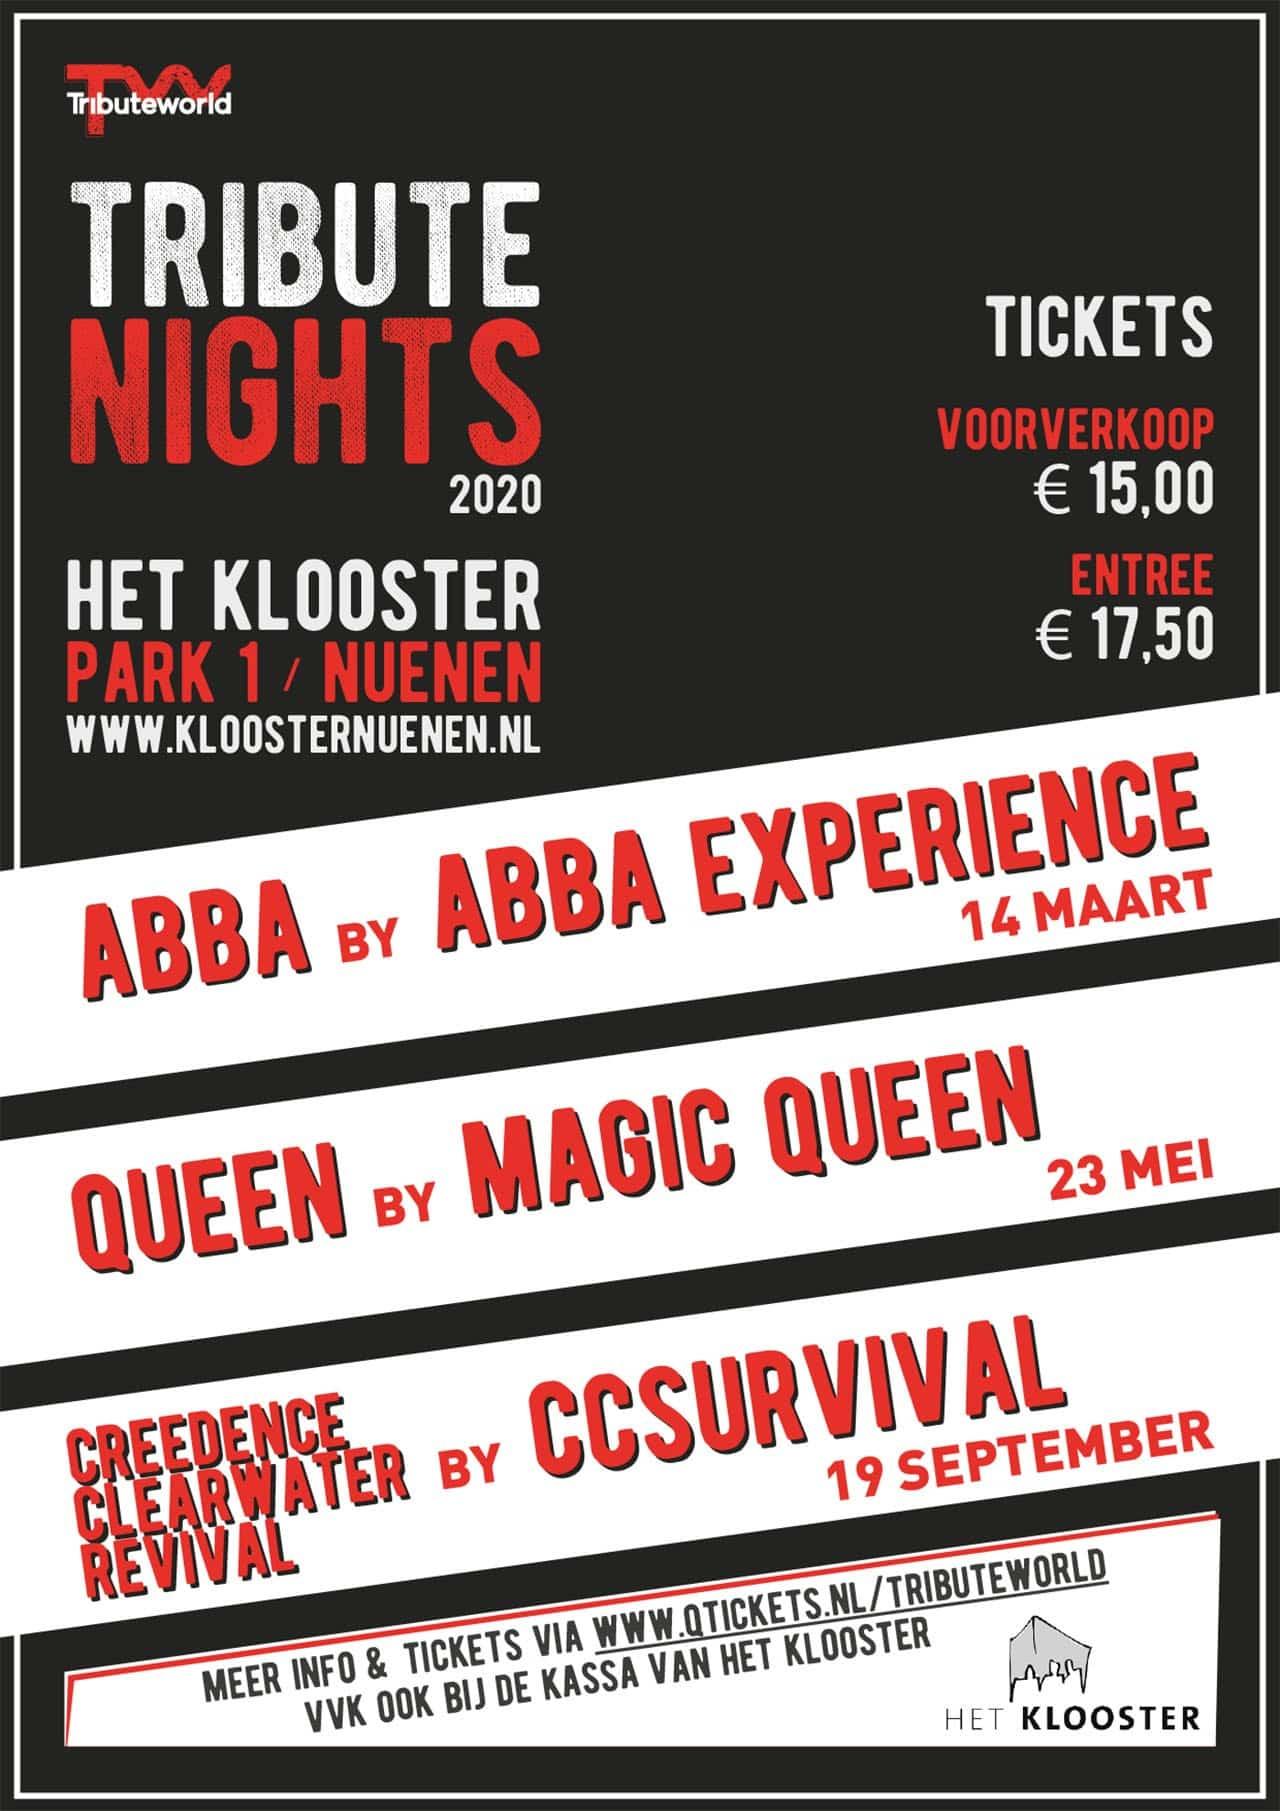 Tributeworld/ Klooster Nuenen